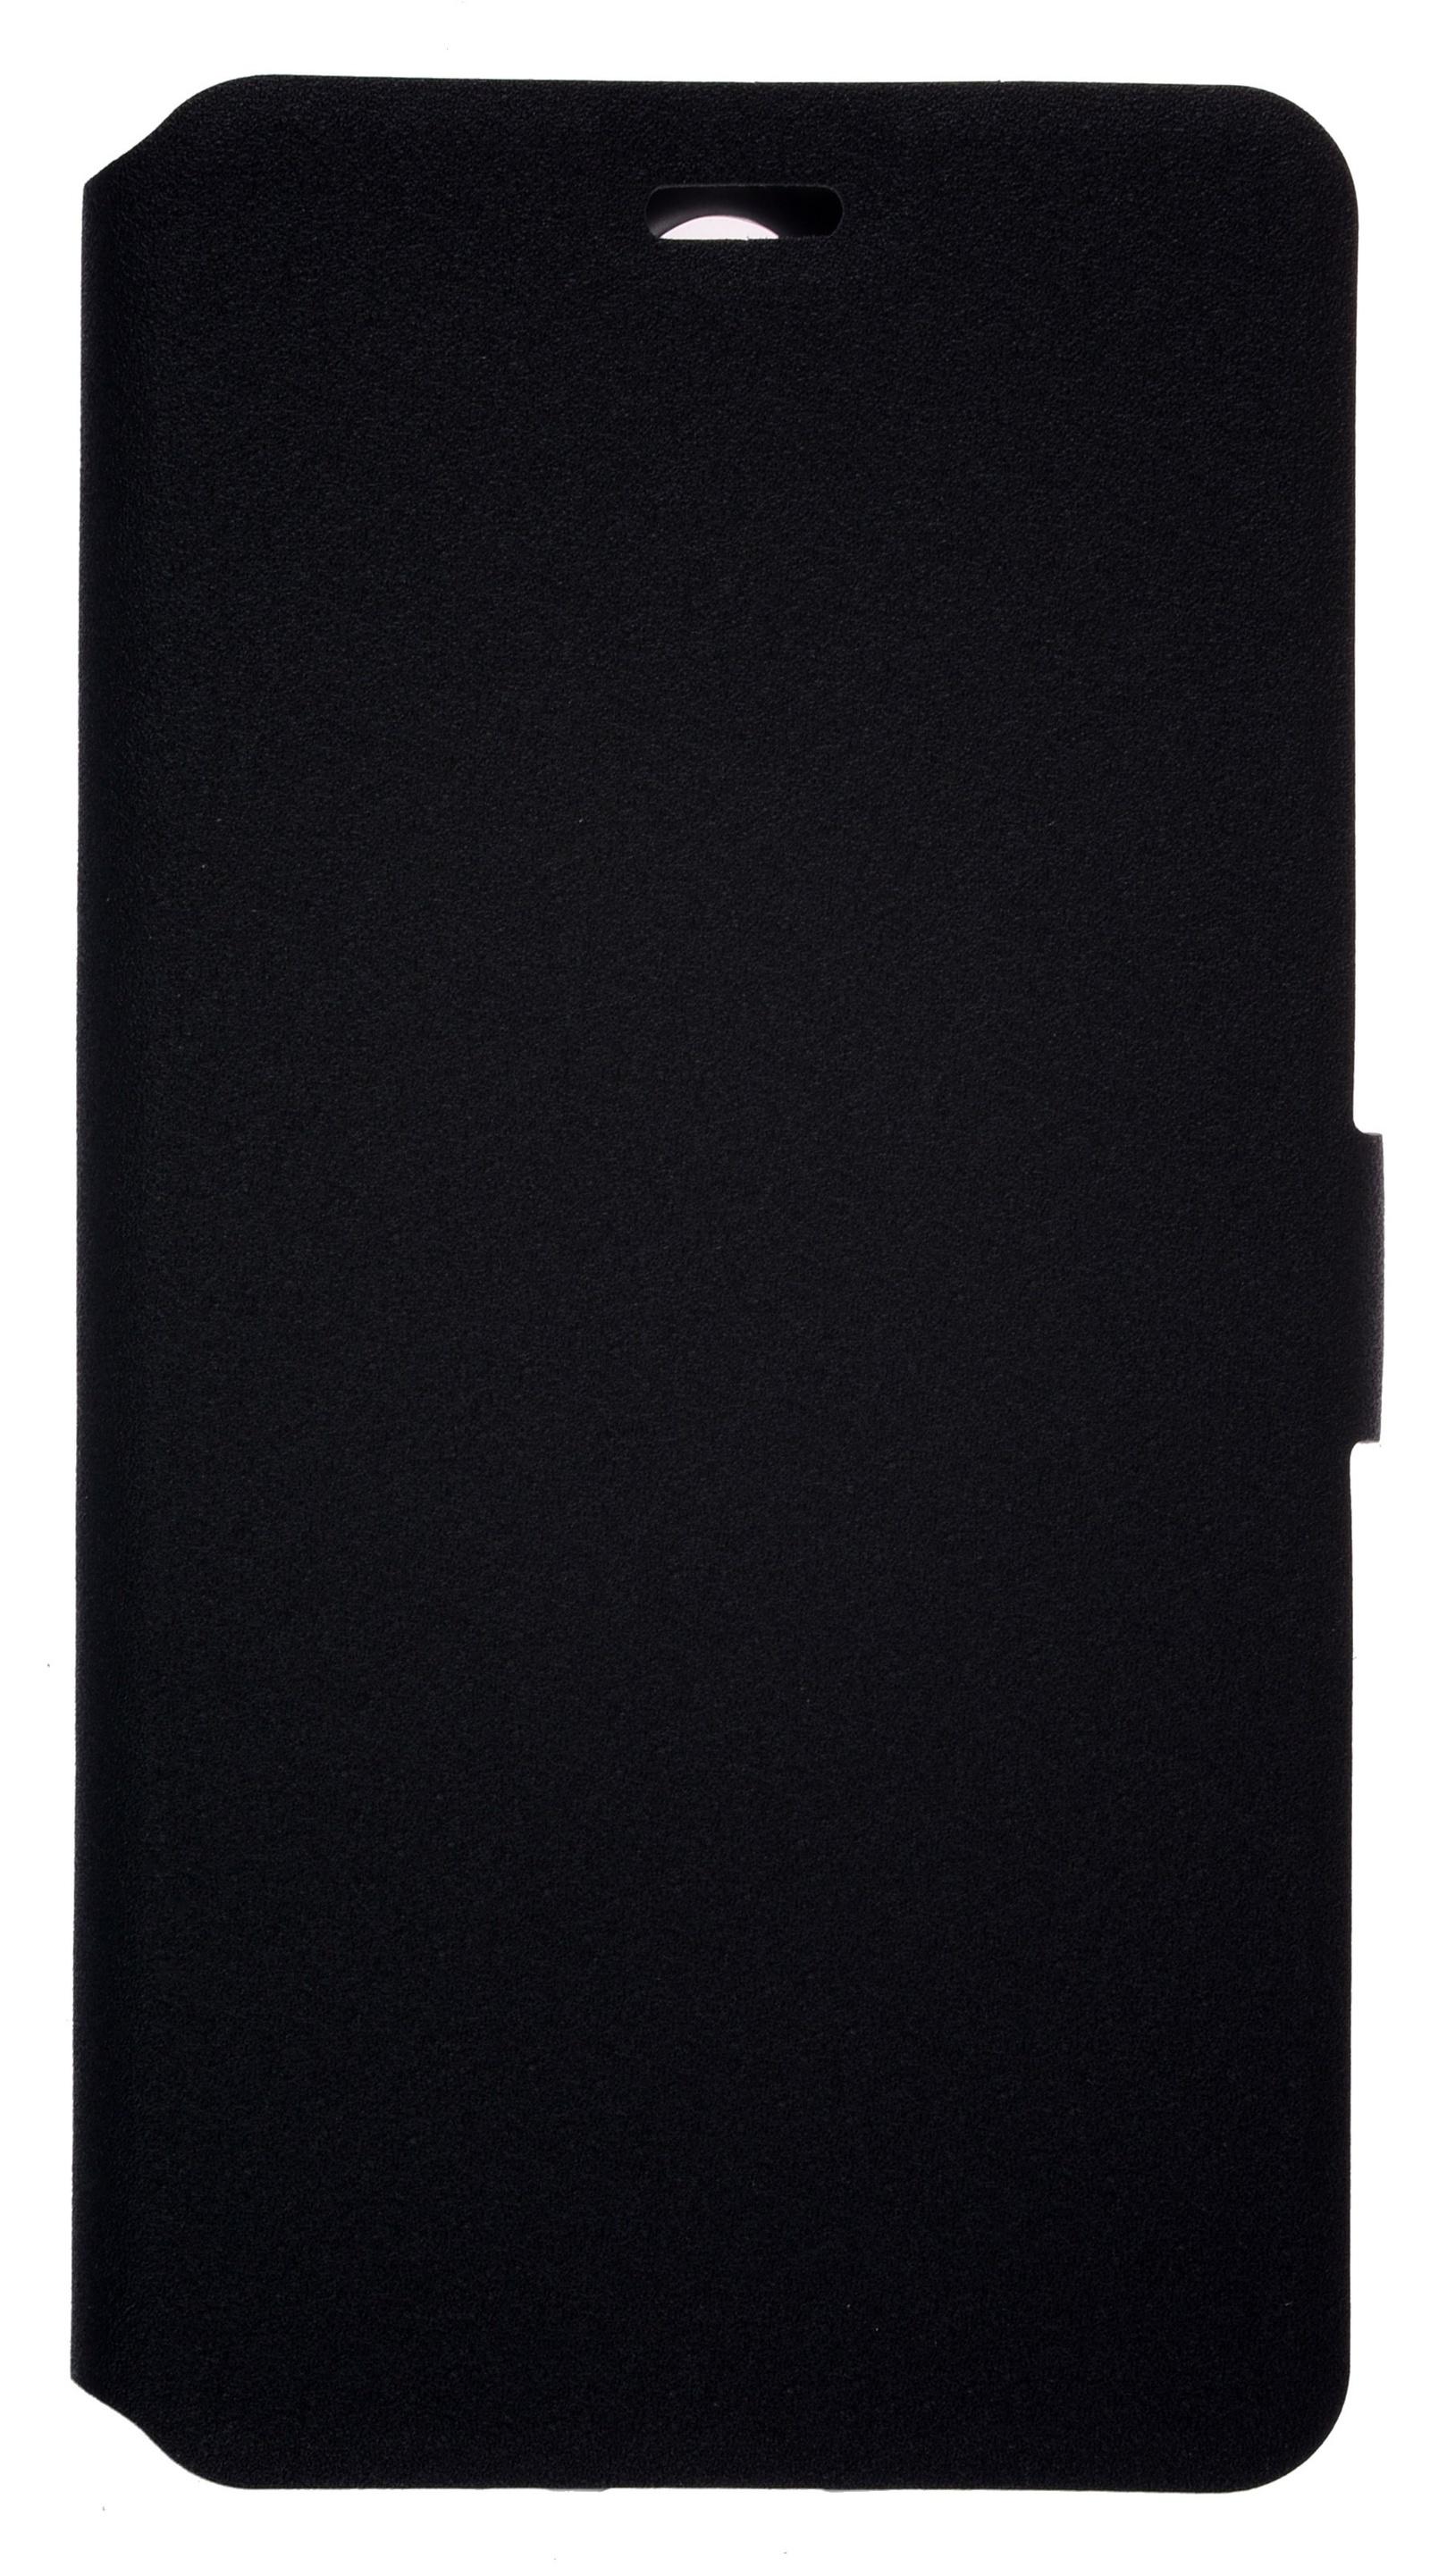 Чехол Prime Book для Nokia 8 чехол nokia чехол nokia 8 leather flip cover black cp 801